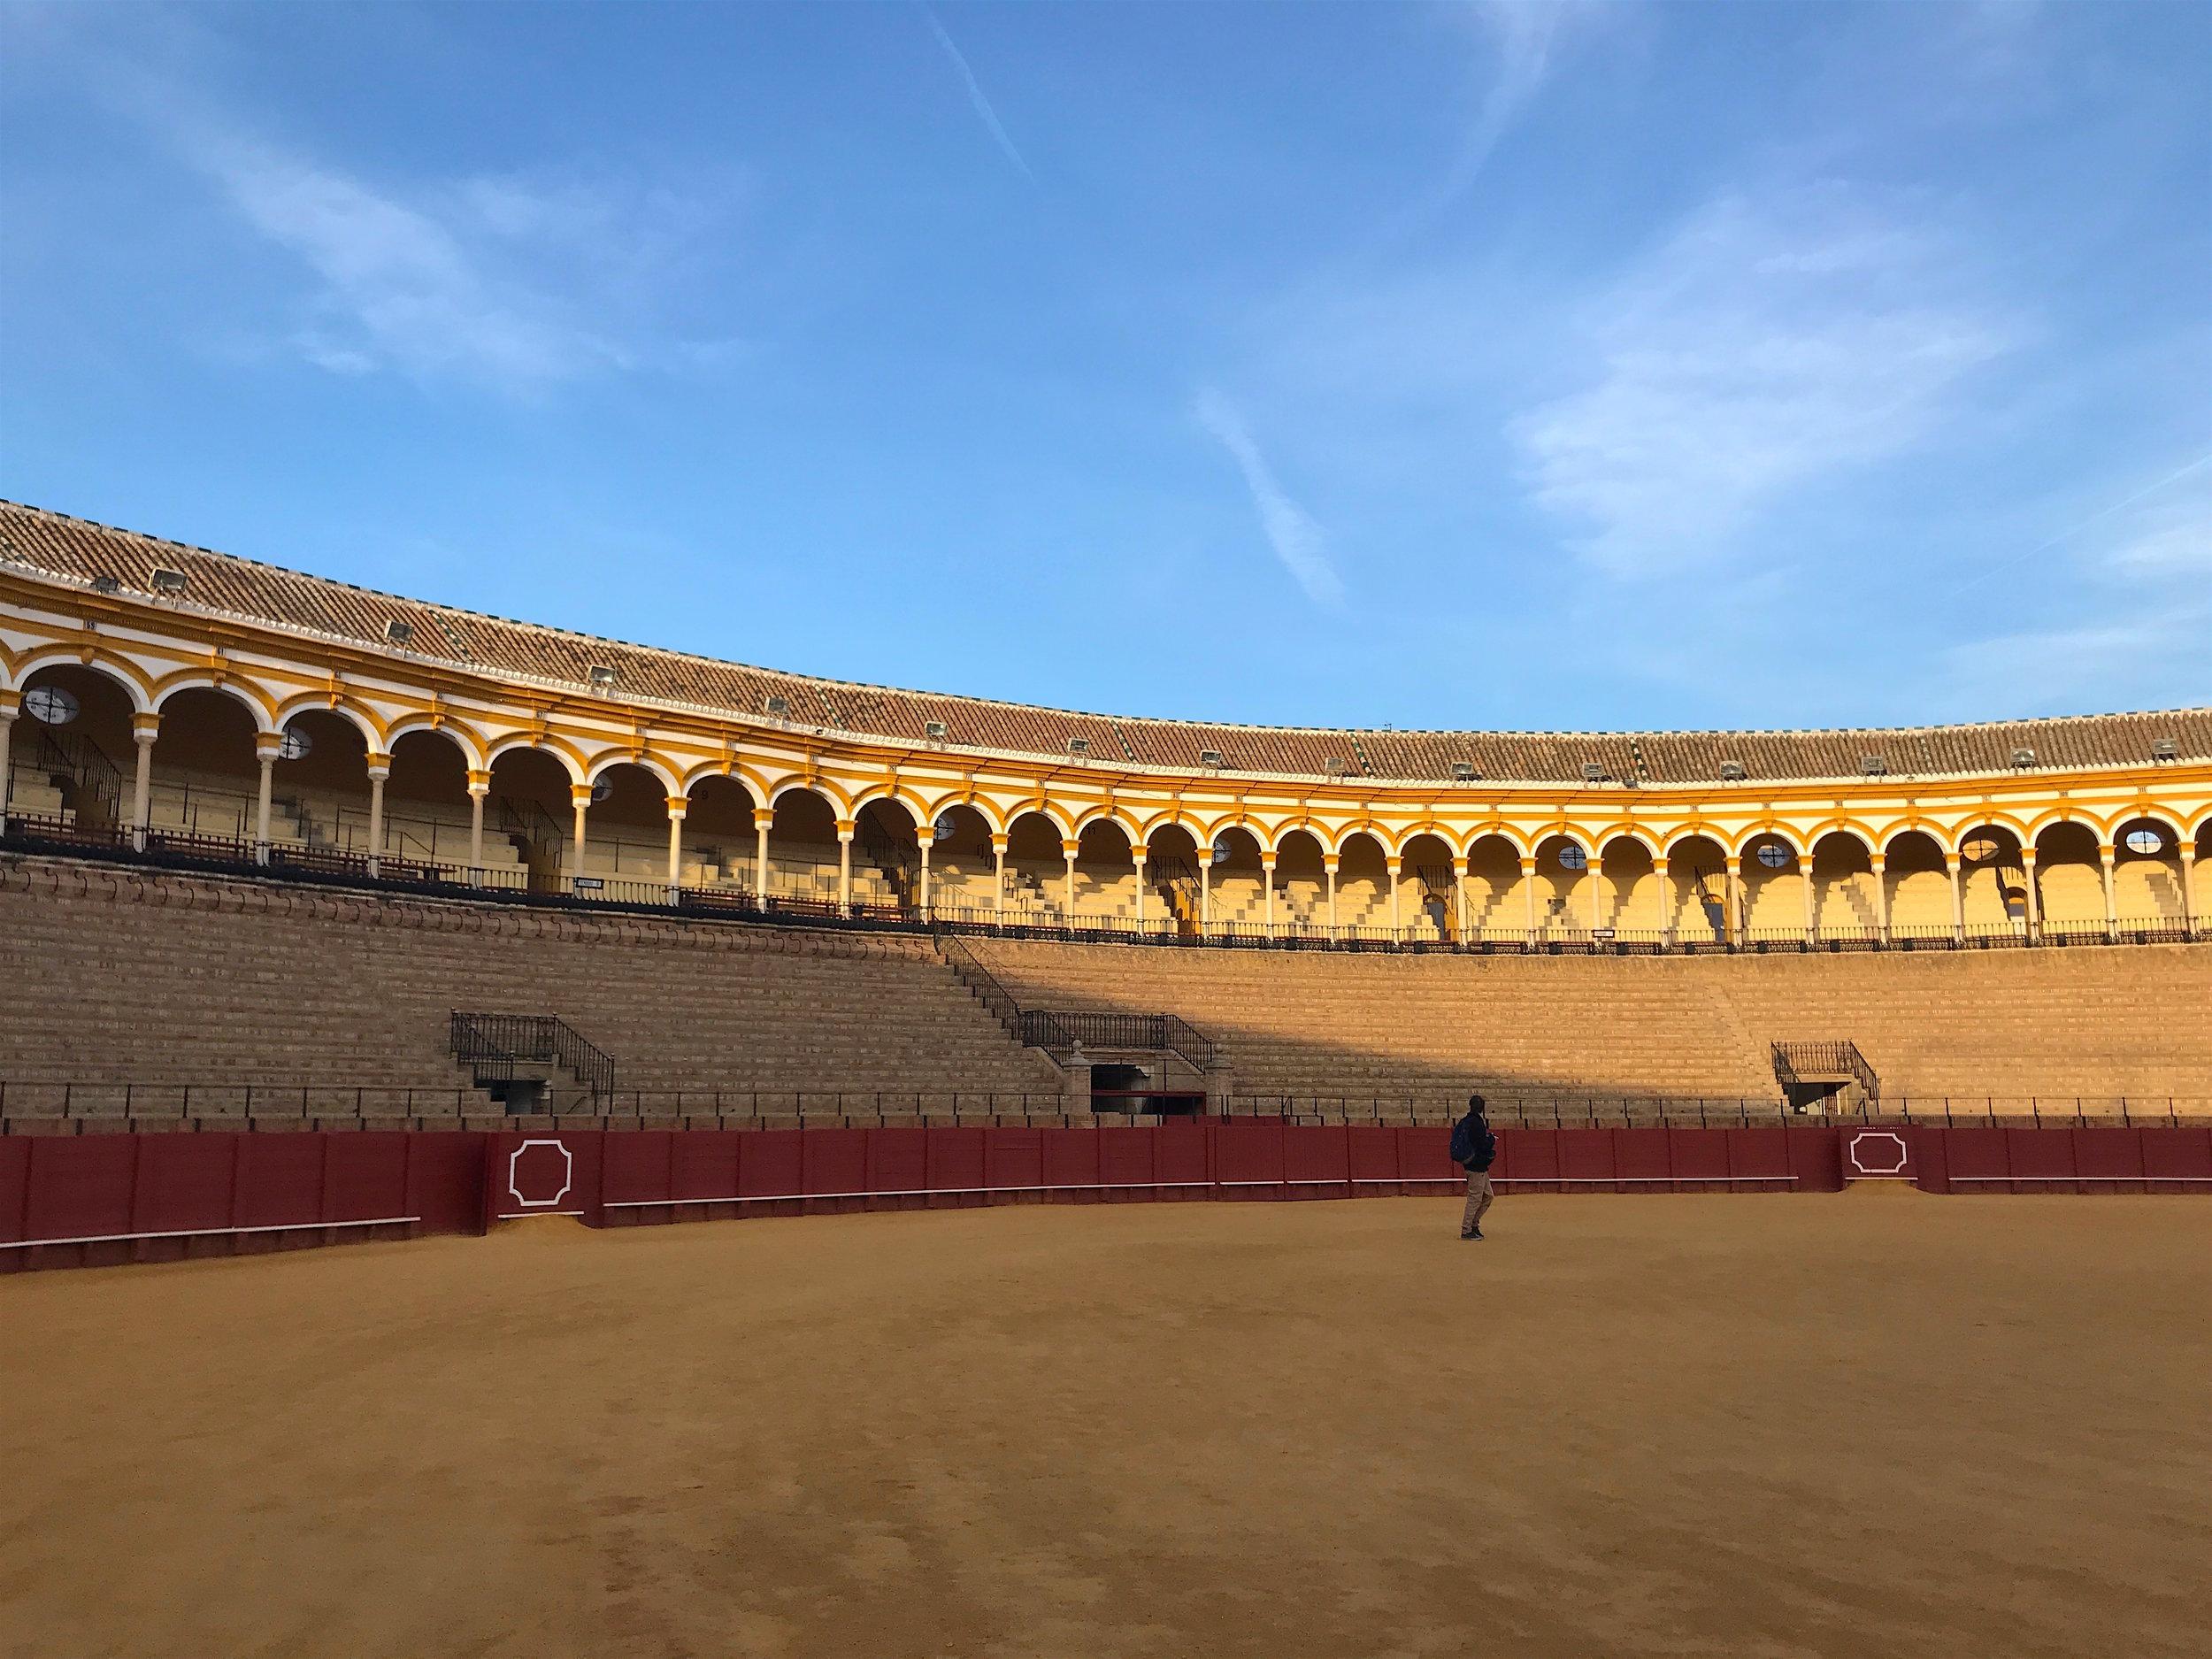 Maestranza bullring in Sevilla, Spain